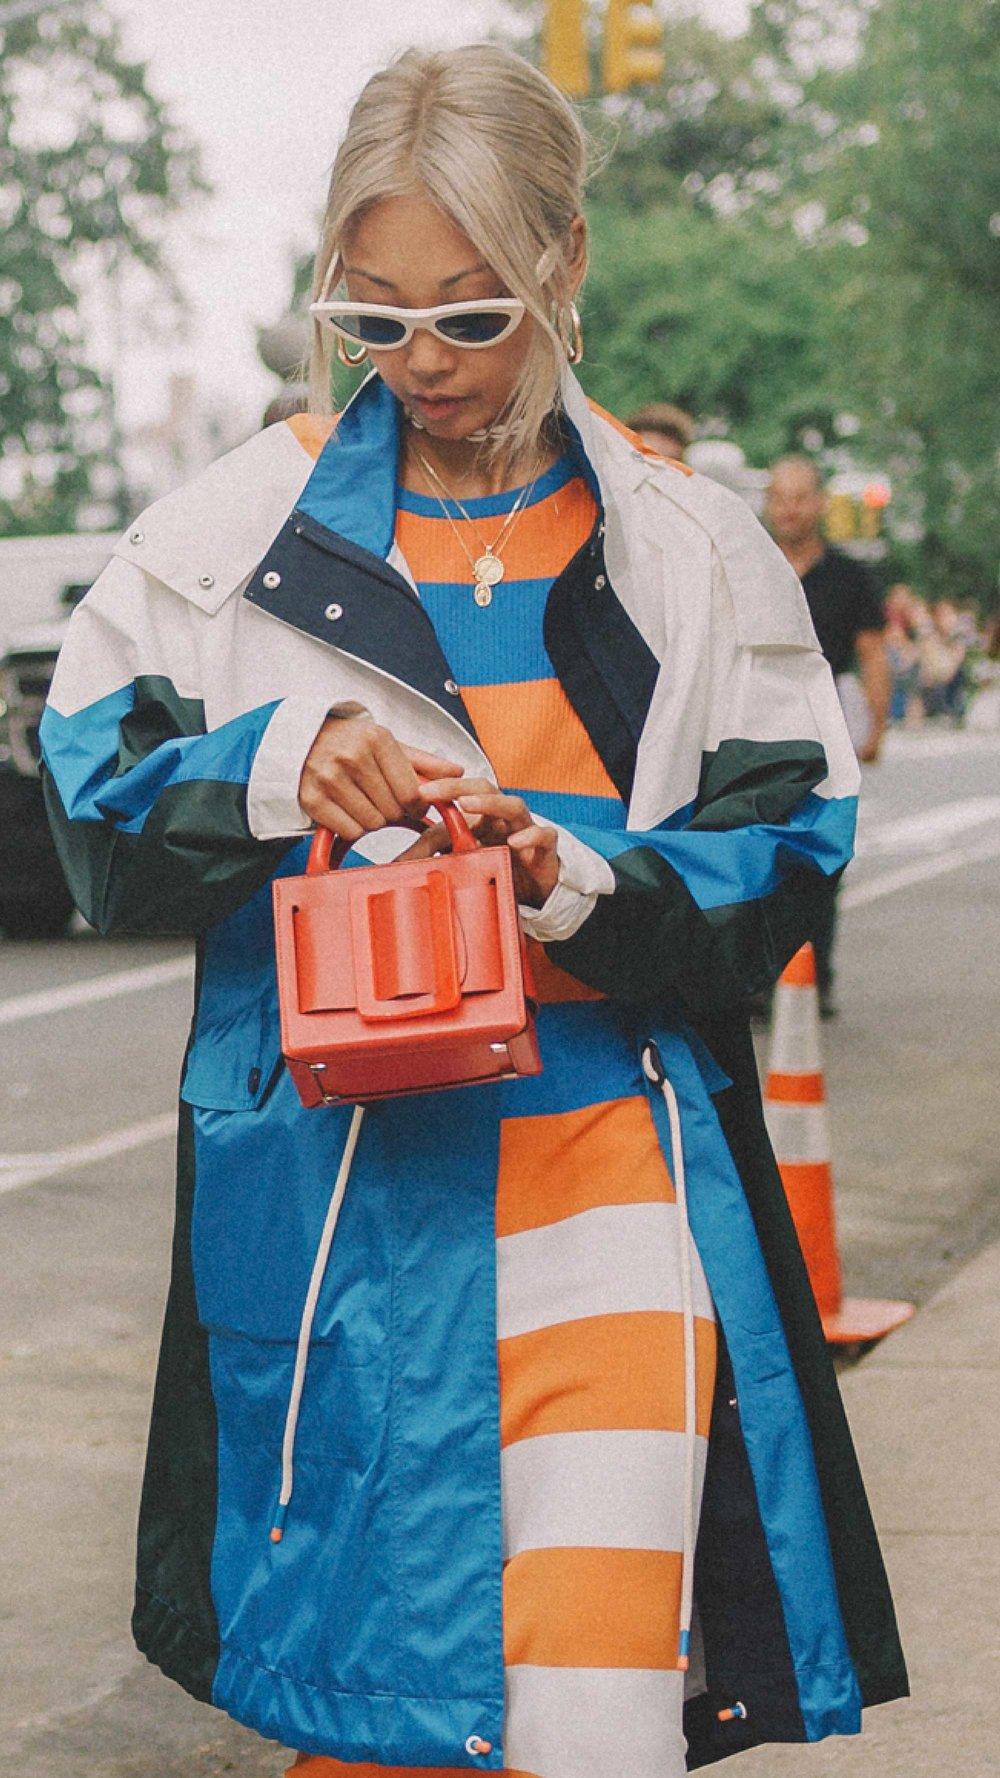 New-York-Fashion-Week-NYFW-SS18-street-style-day-two-SS18.jpg6.jpg